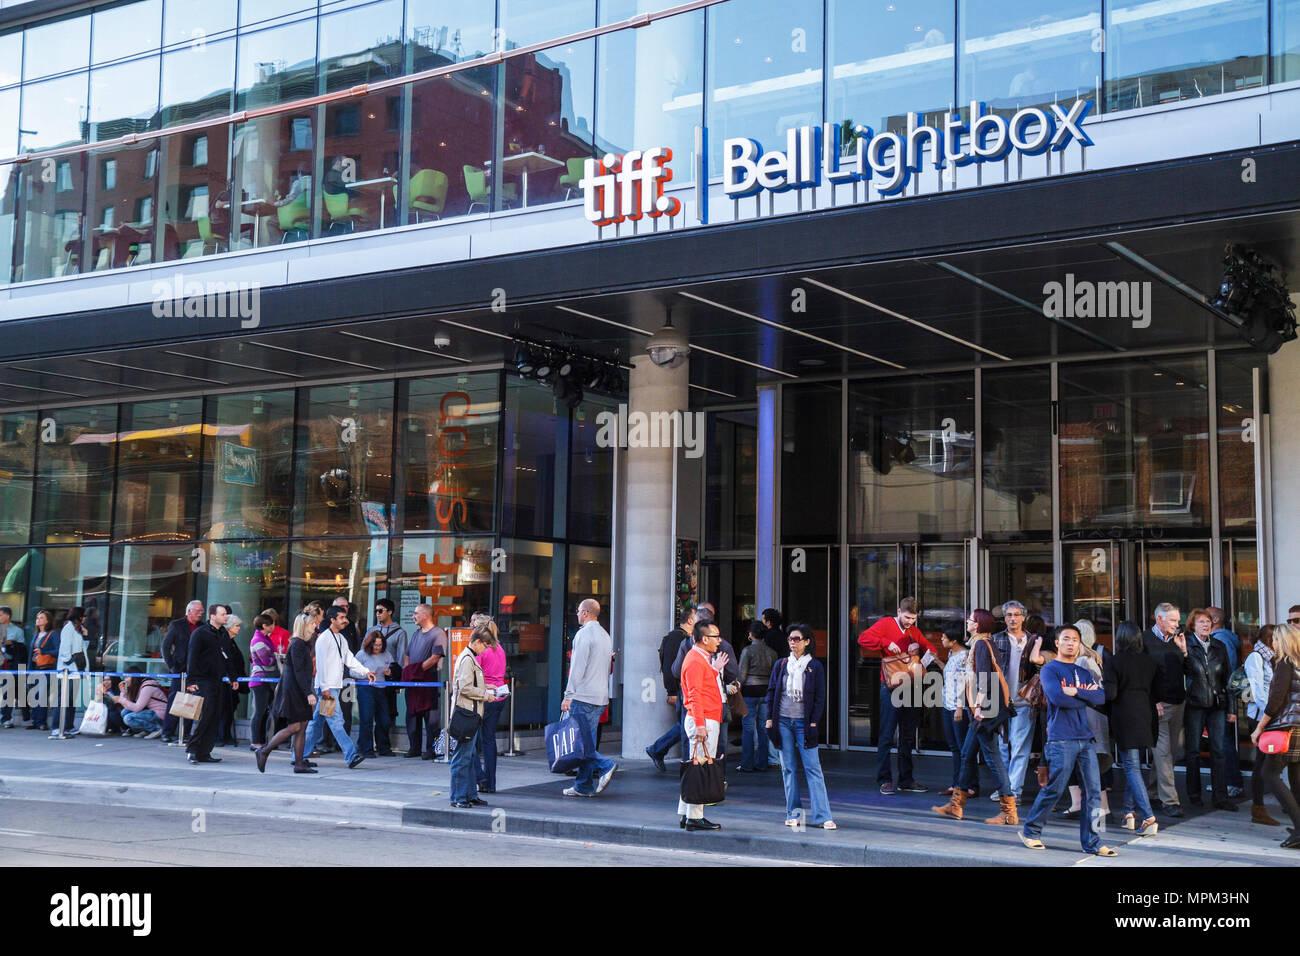 Toronto Kanada Ontario King Street West TIFF Bell Lightbox Toronto International Film Festival Veranstaltungsort überfüllt Eingang Linie Stockbild